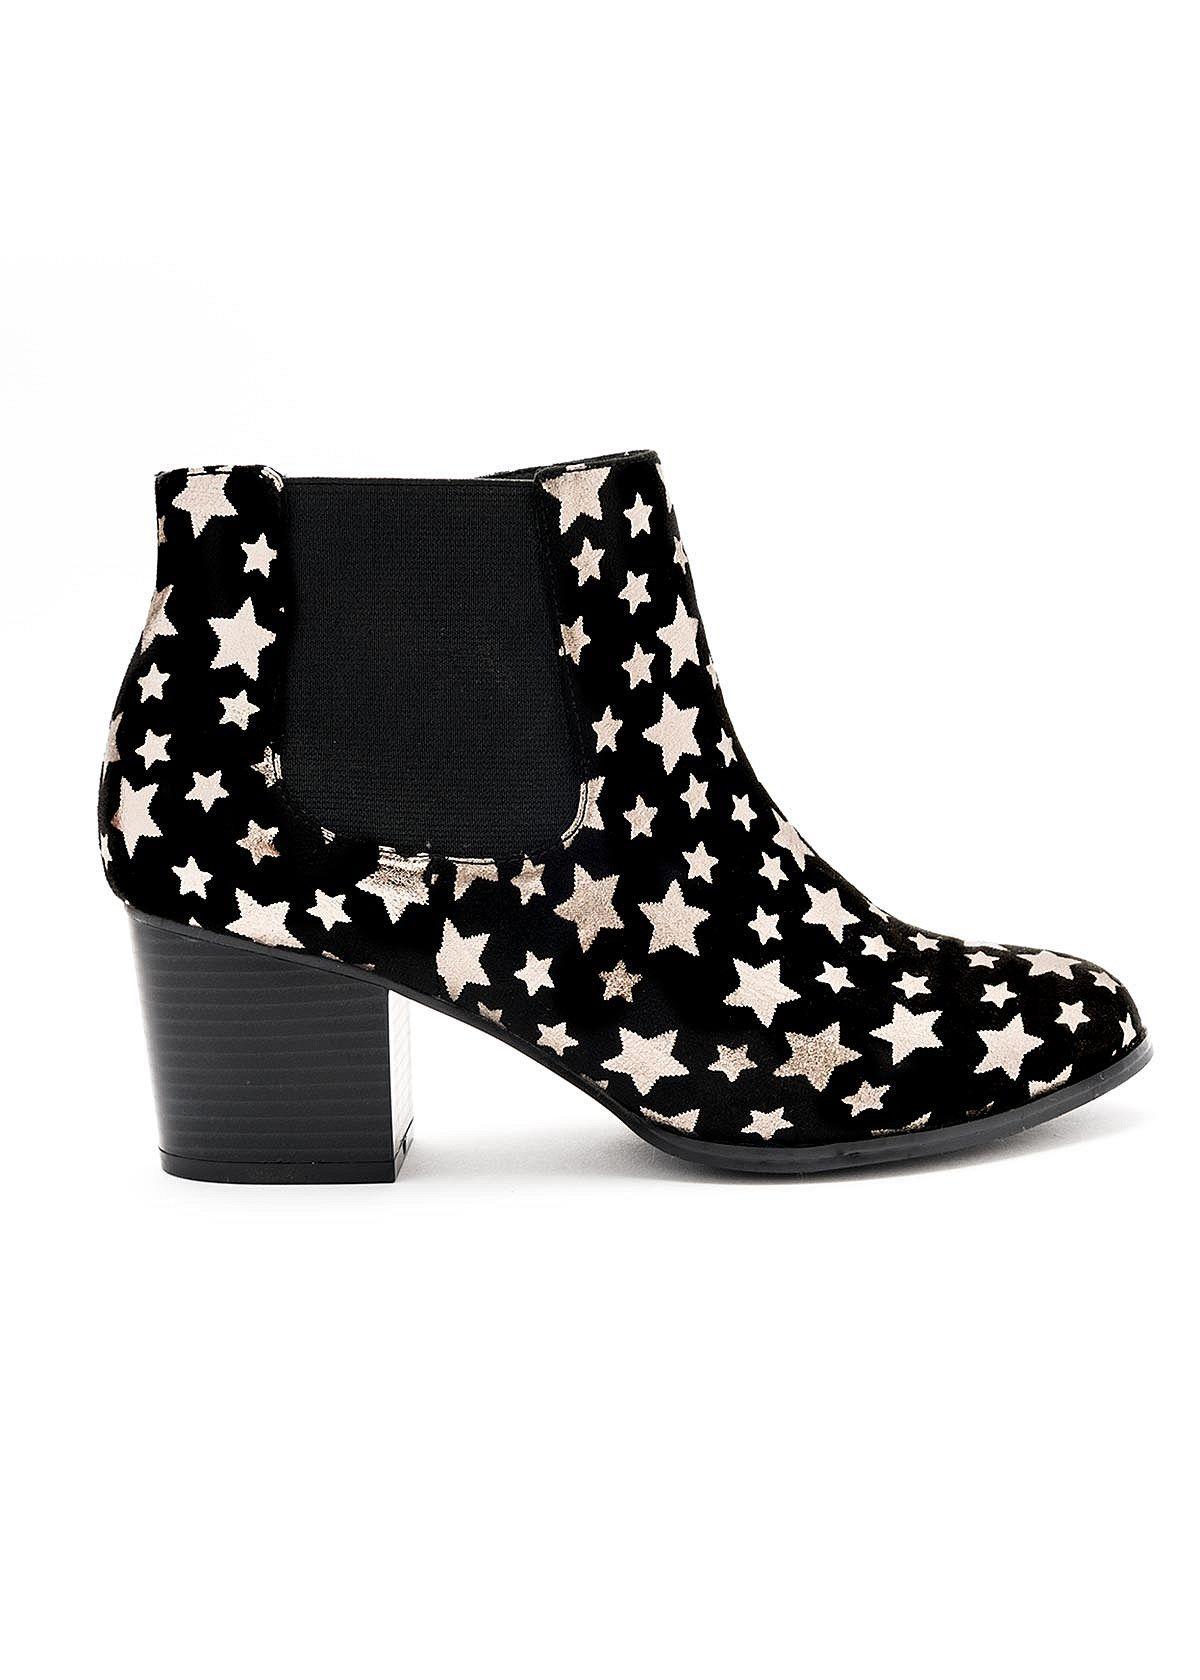 SUPERNOVA BOOT / Black/metallic / A70166 Boots, Black